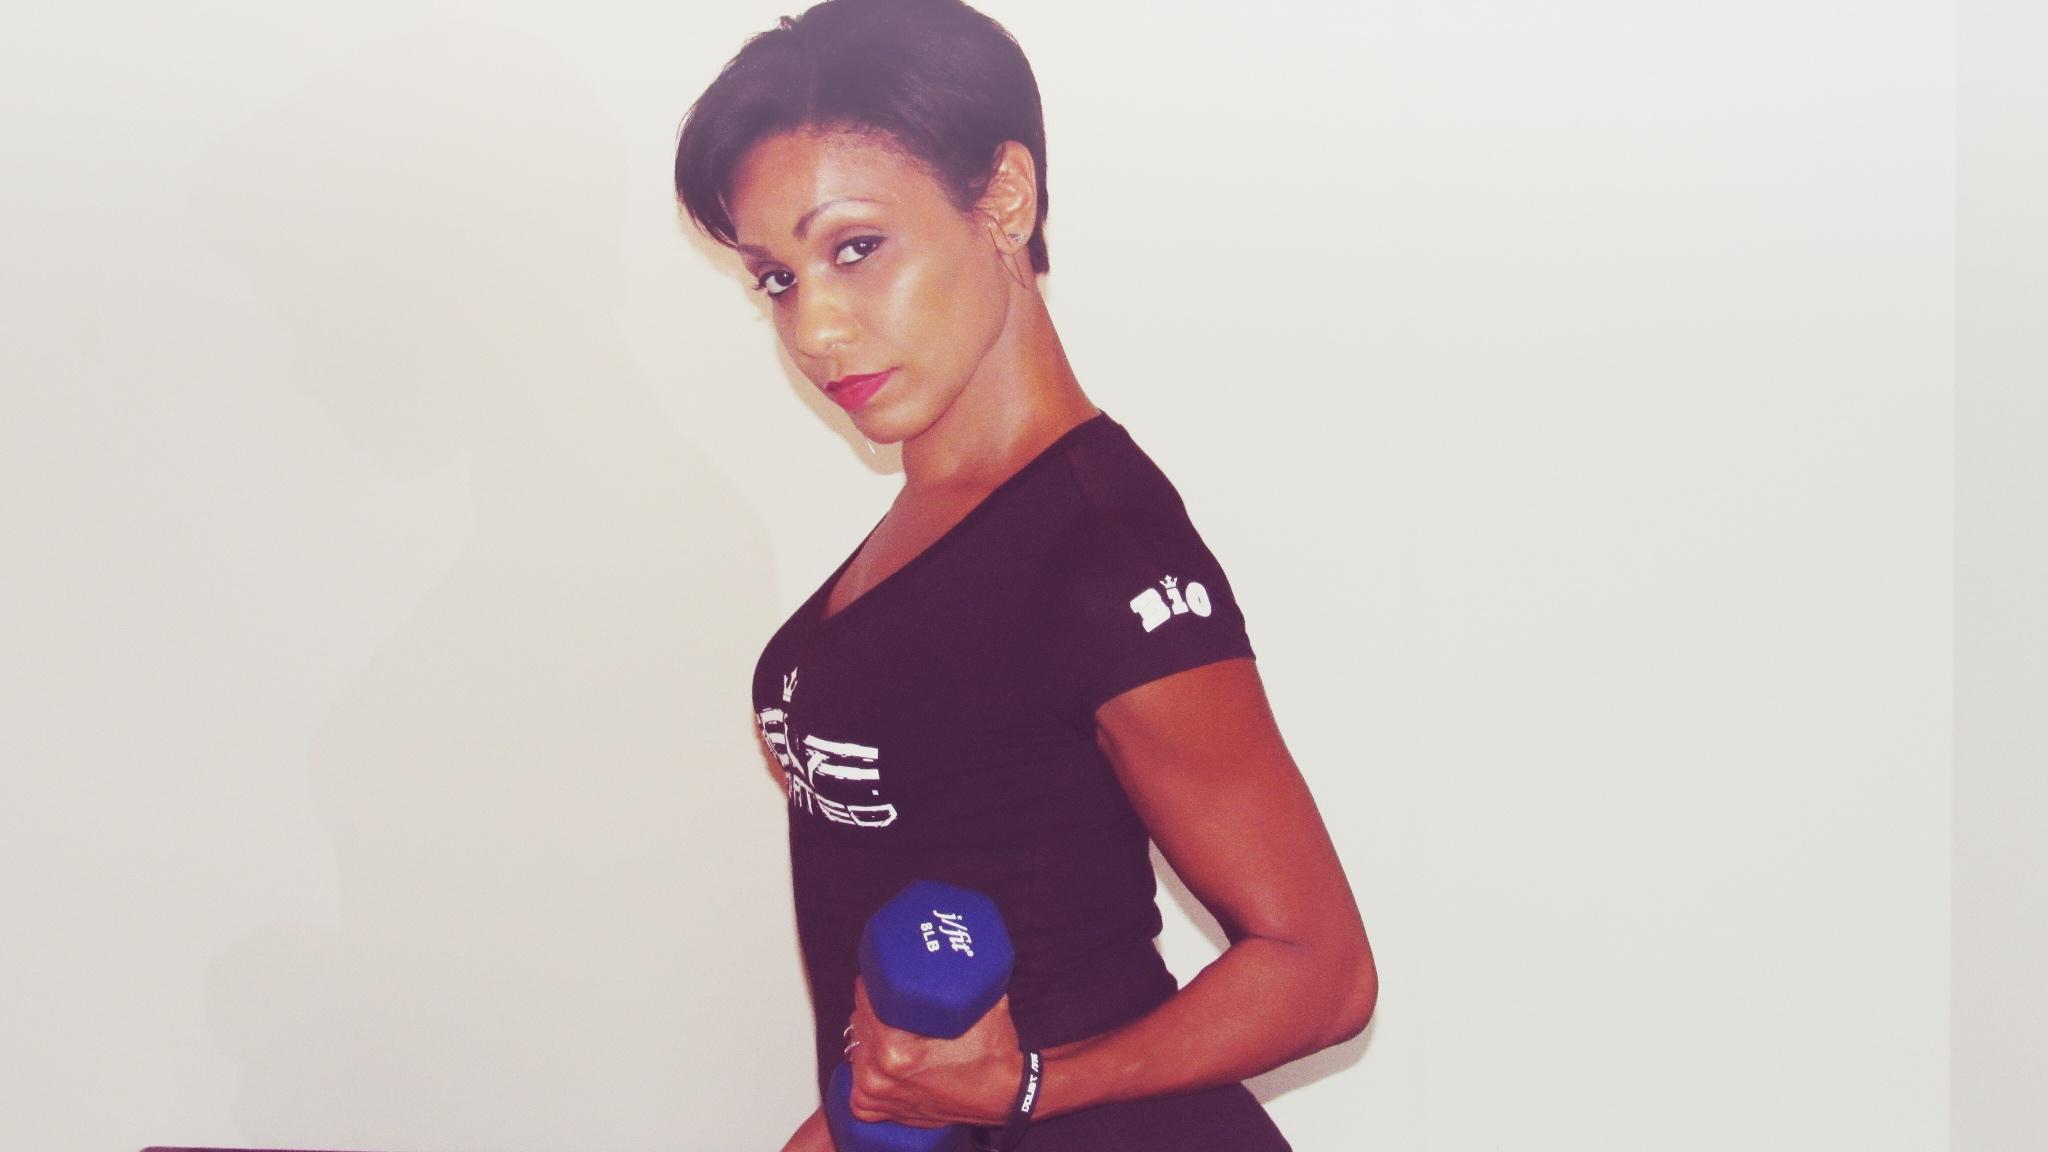 BiO, Personal training alexandria